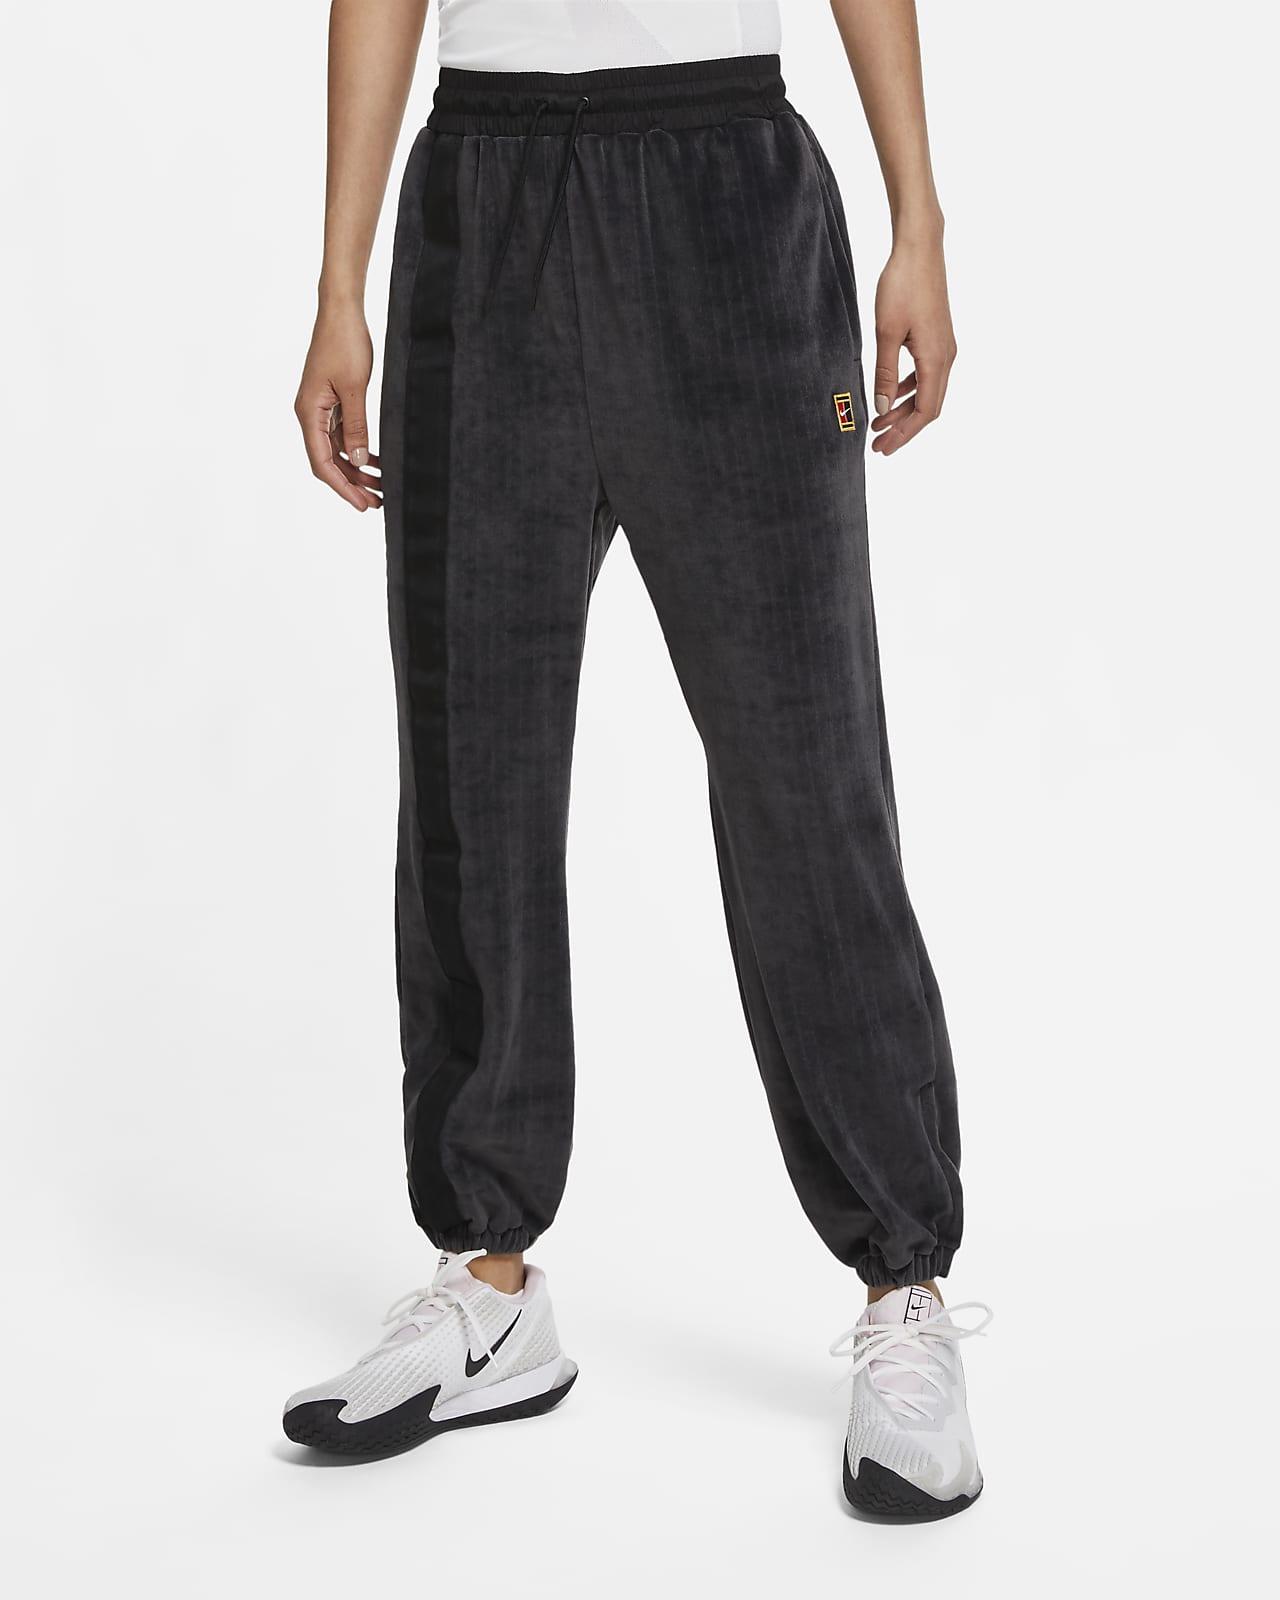 NikeCourt Women's Tennis Trousers